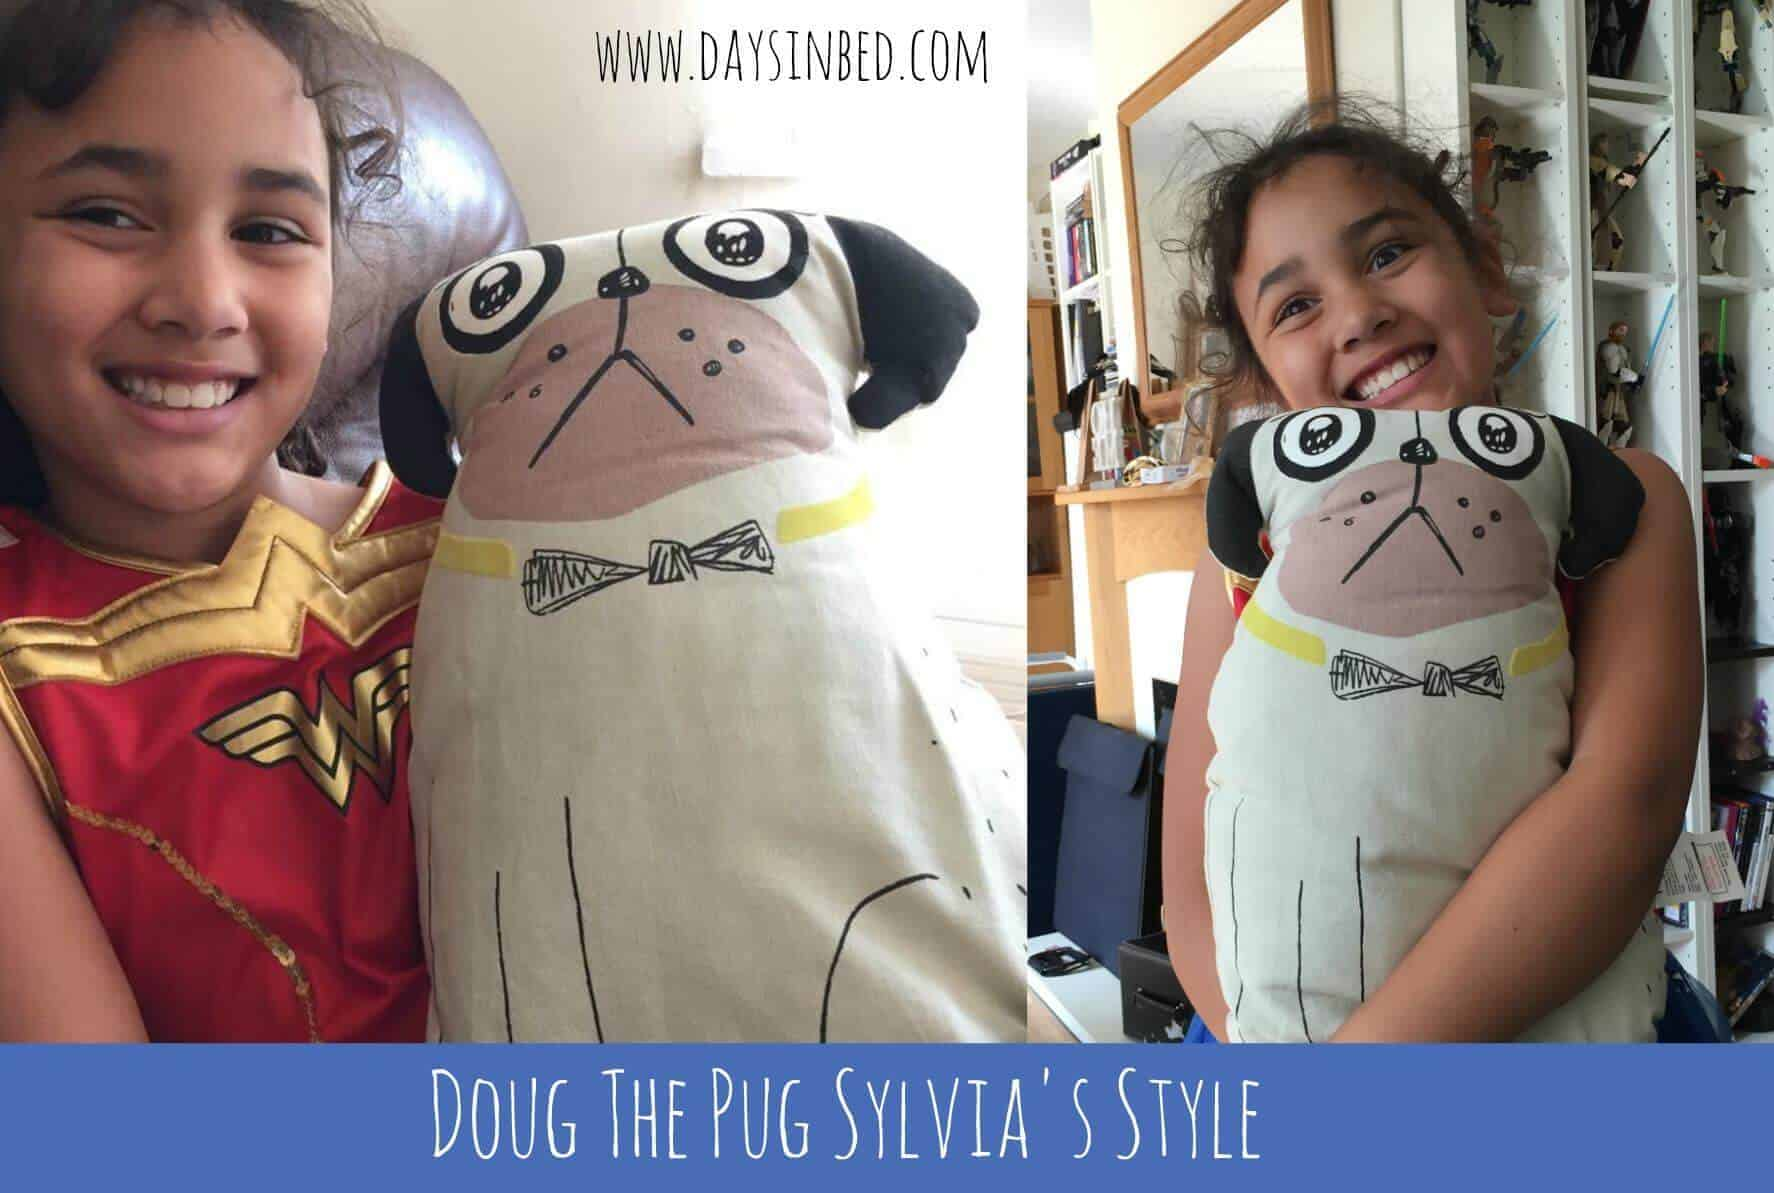 Dough the pug